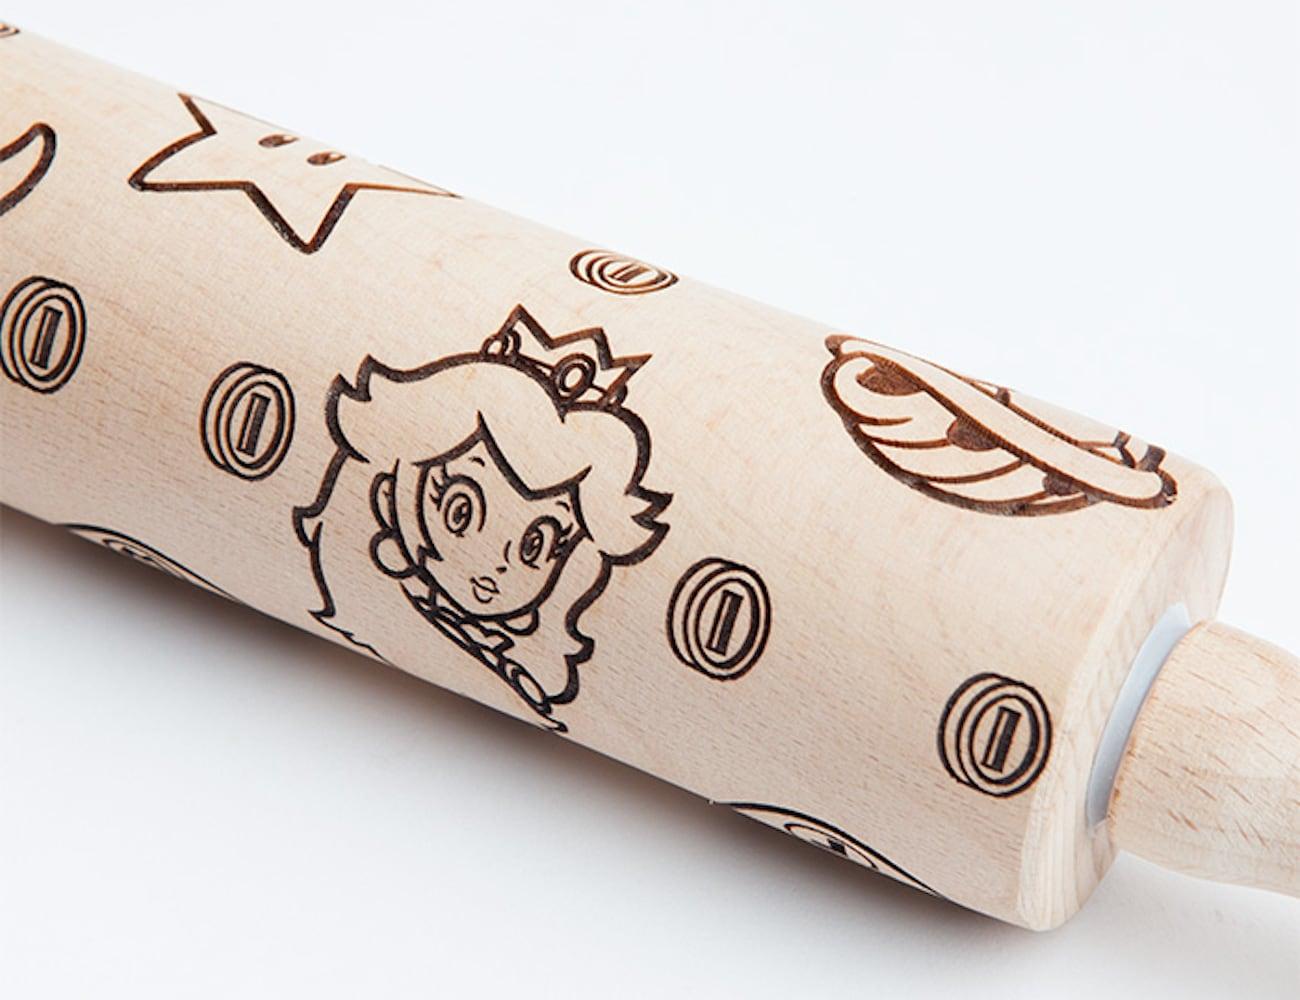 ThinkGeek Super Mario Molded Rolling Pin